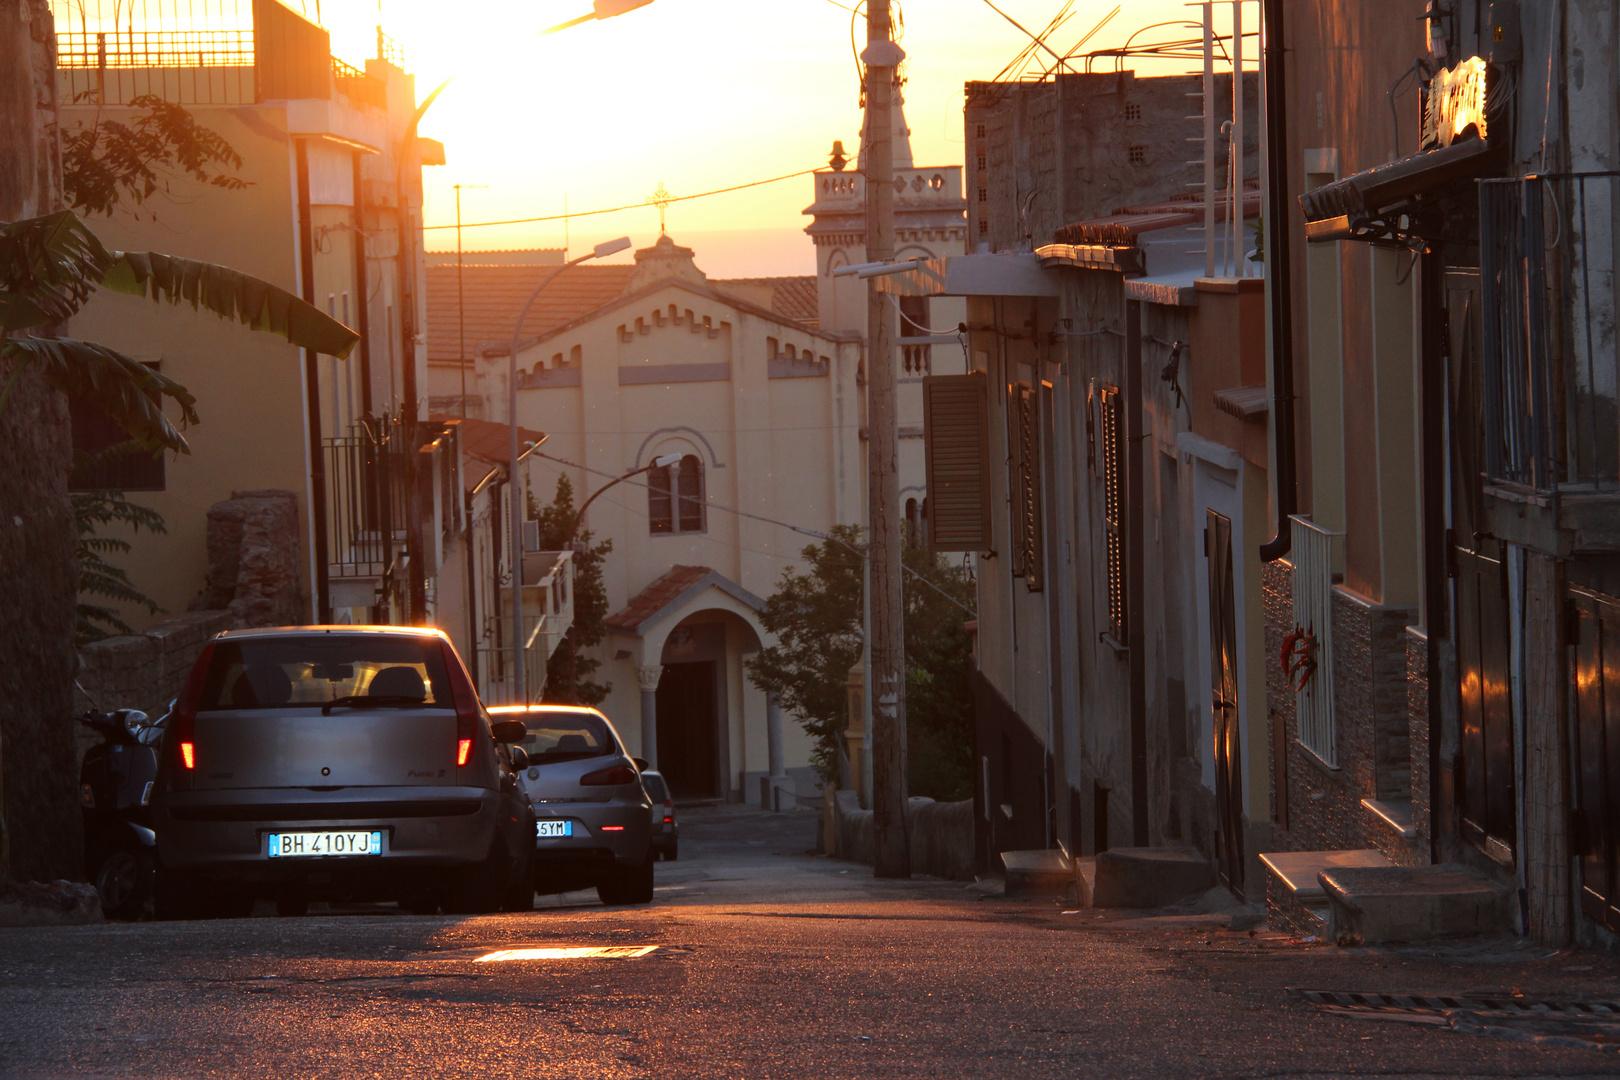 Abend in Tropea